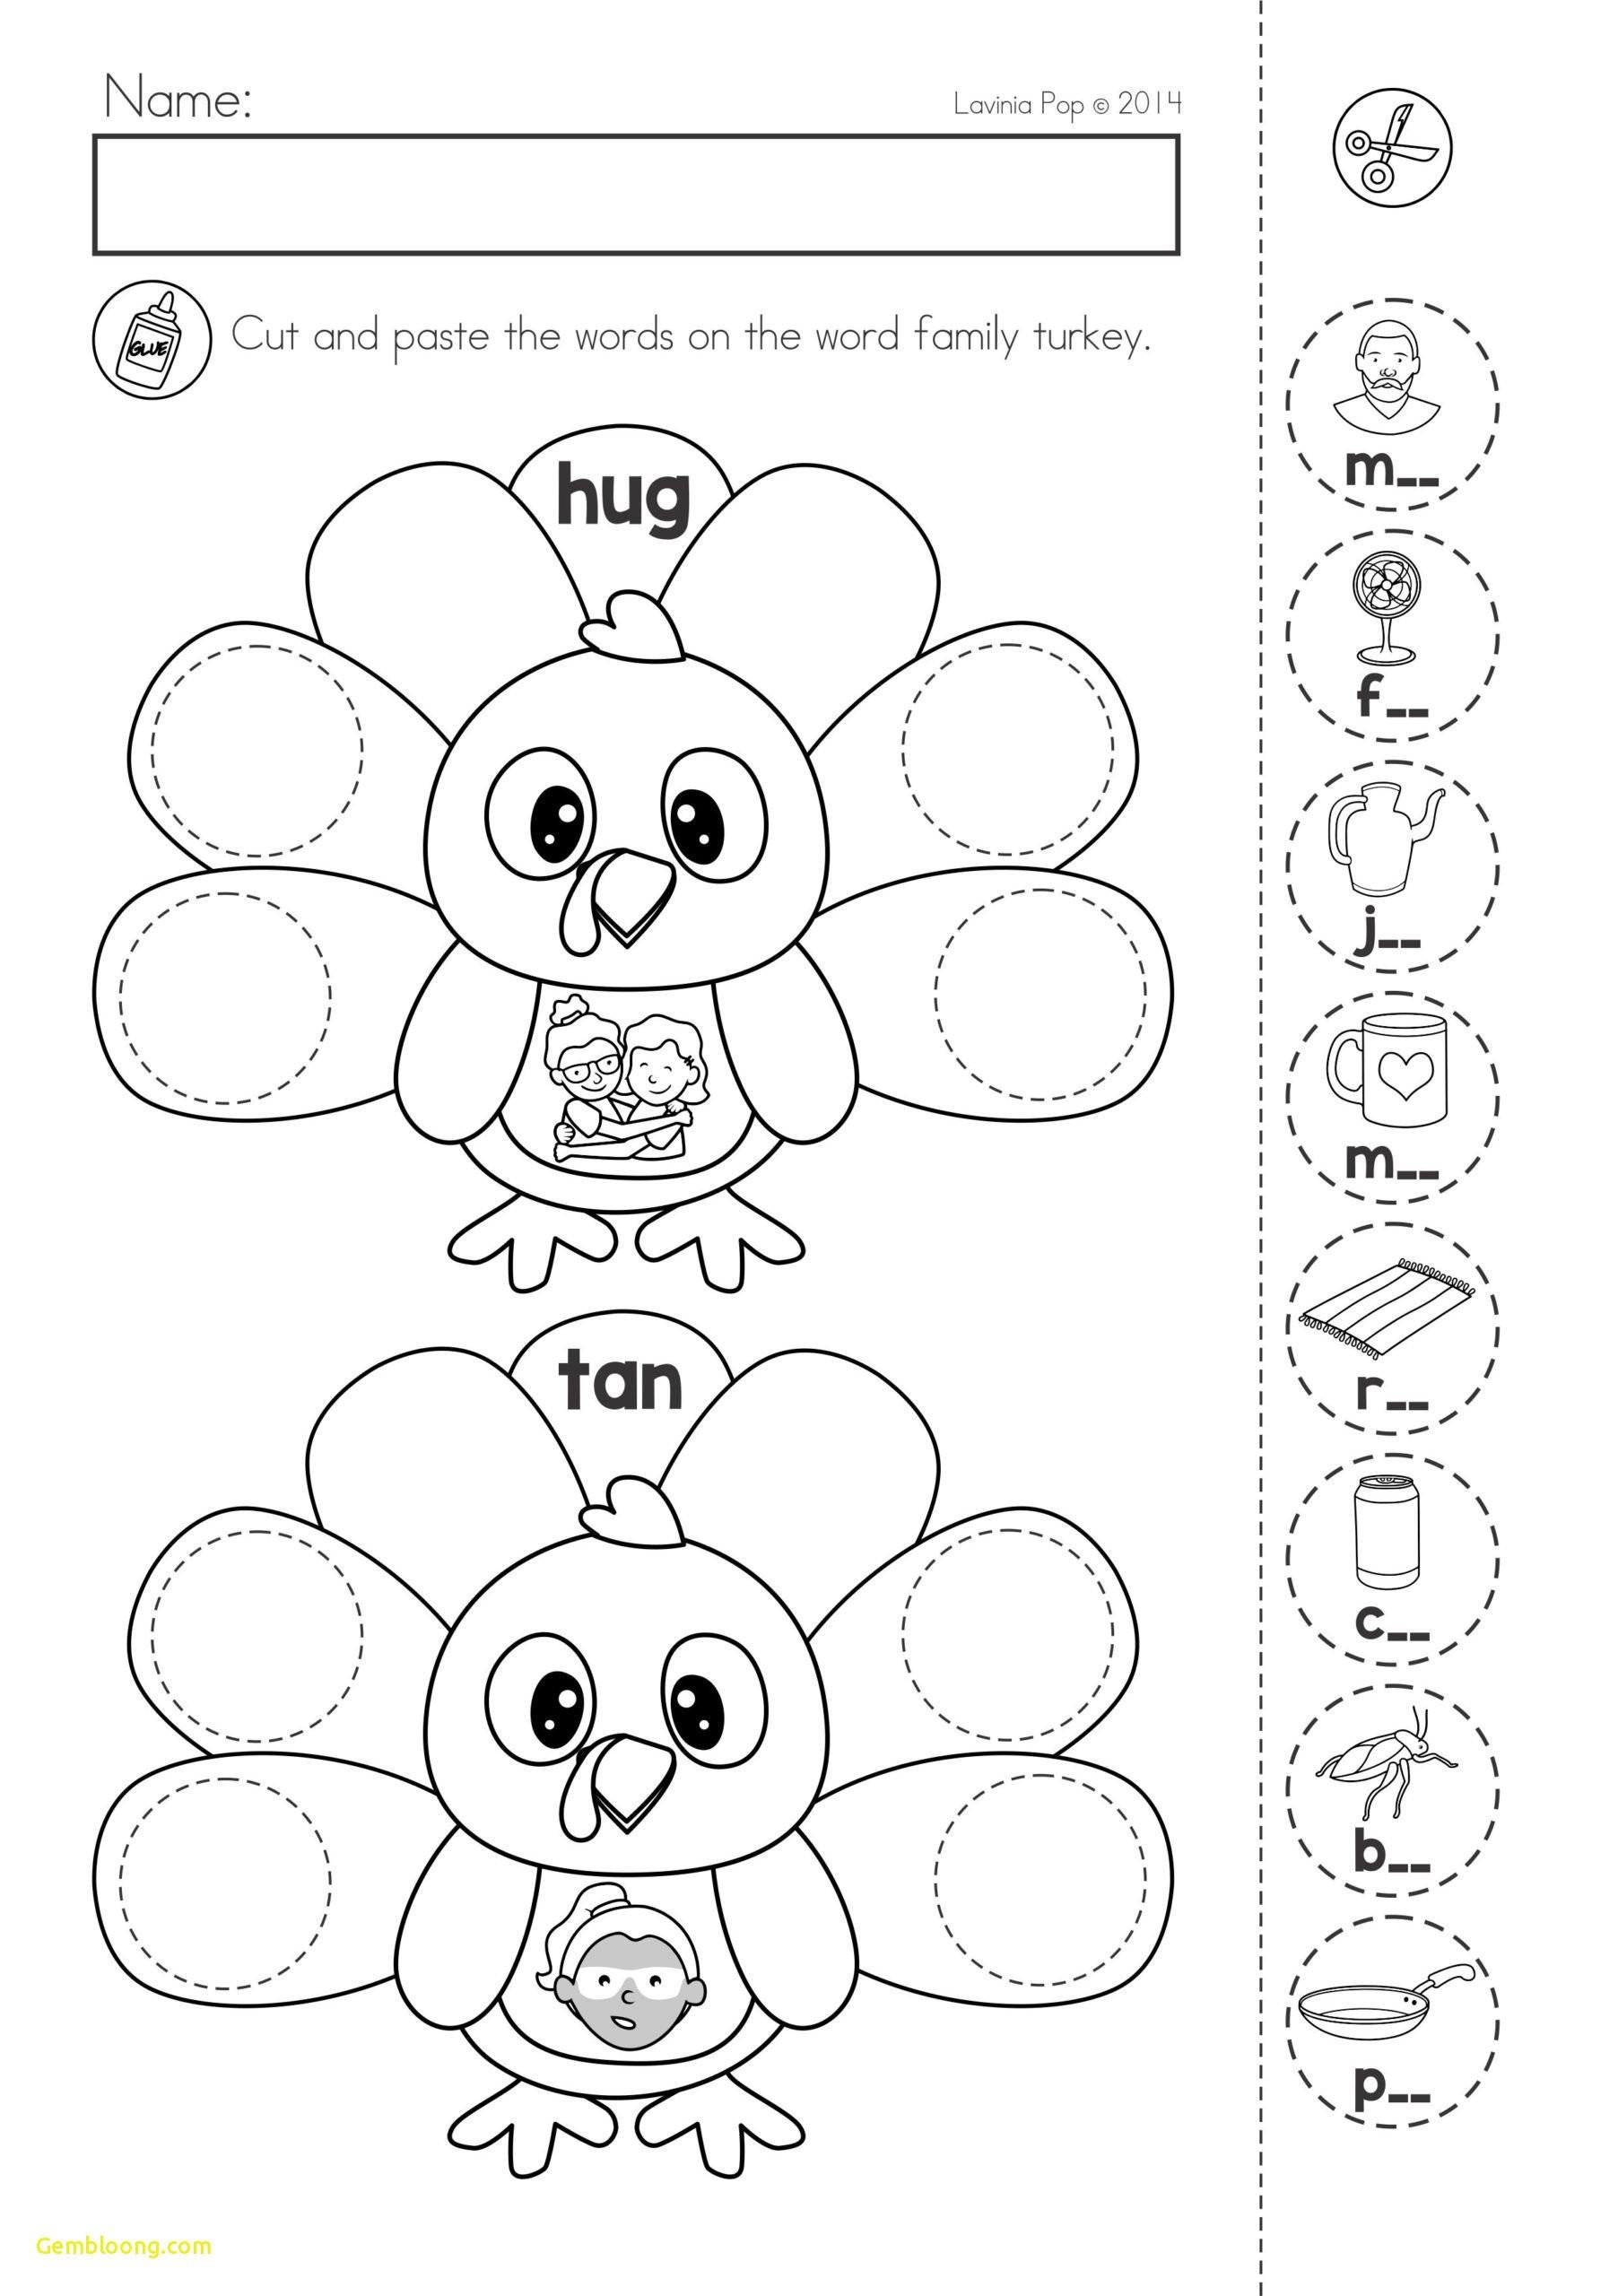 The Monkey039s Paw Worksheet the Monkey039s Paw Worksheet Importer List Pdf Myanmar